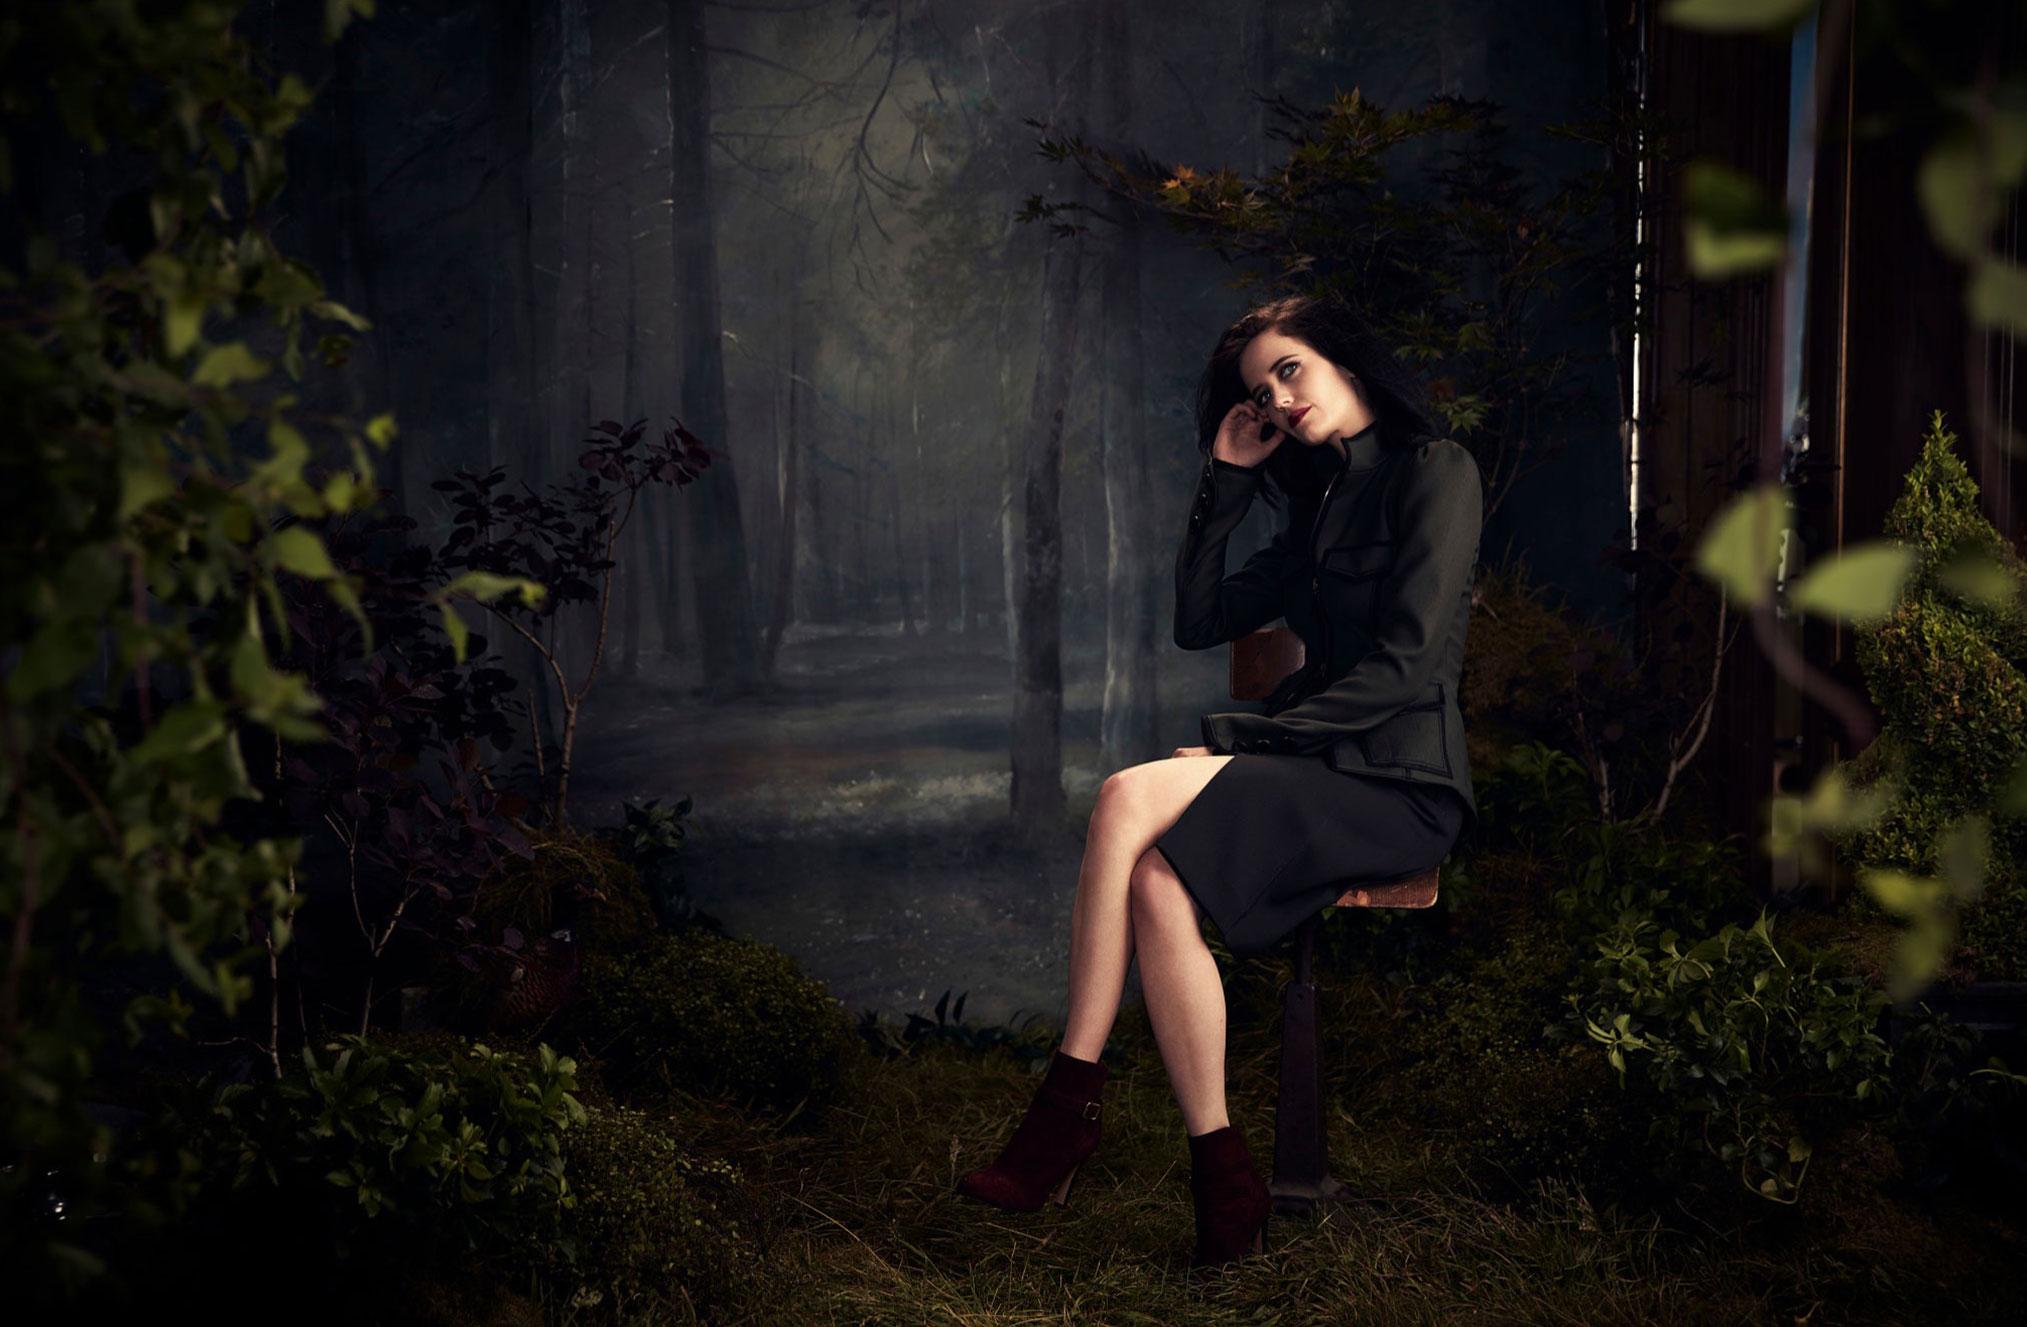 промосъемка Евы Грин для киностудии 20th Century Fox / фото 14